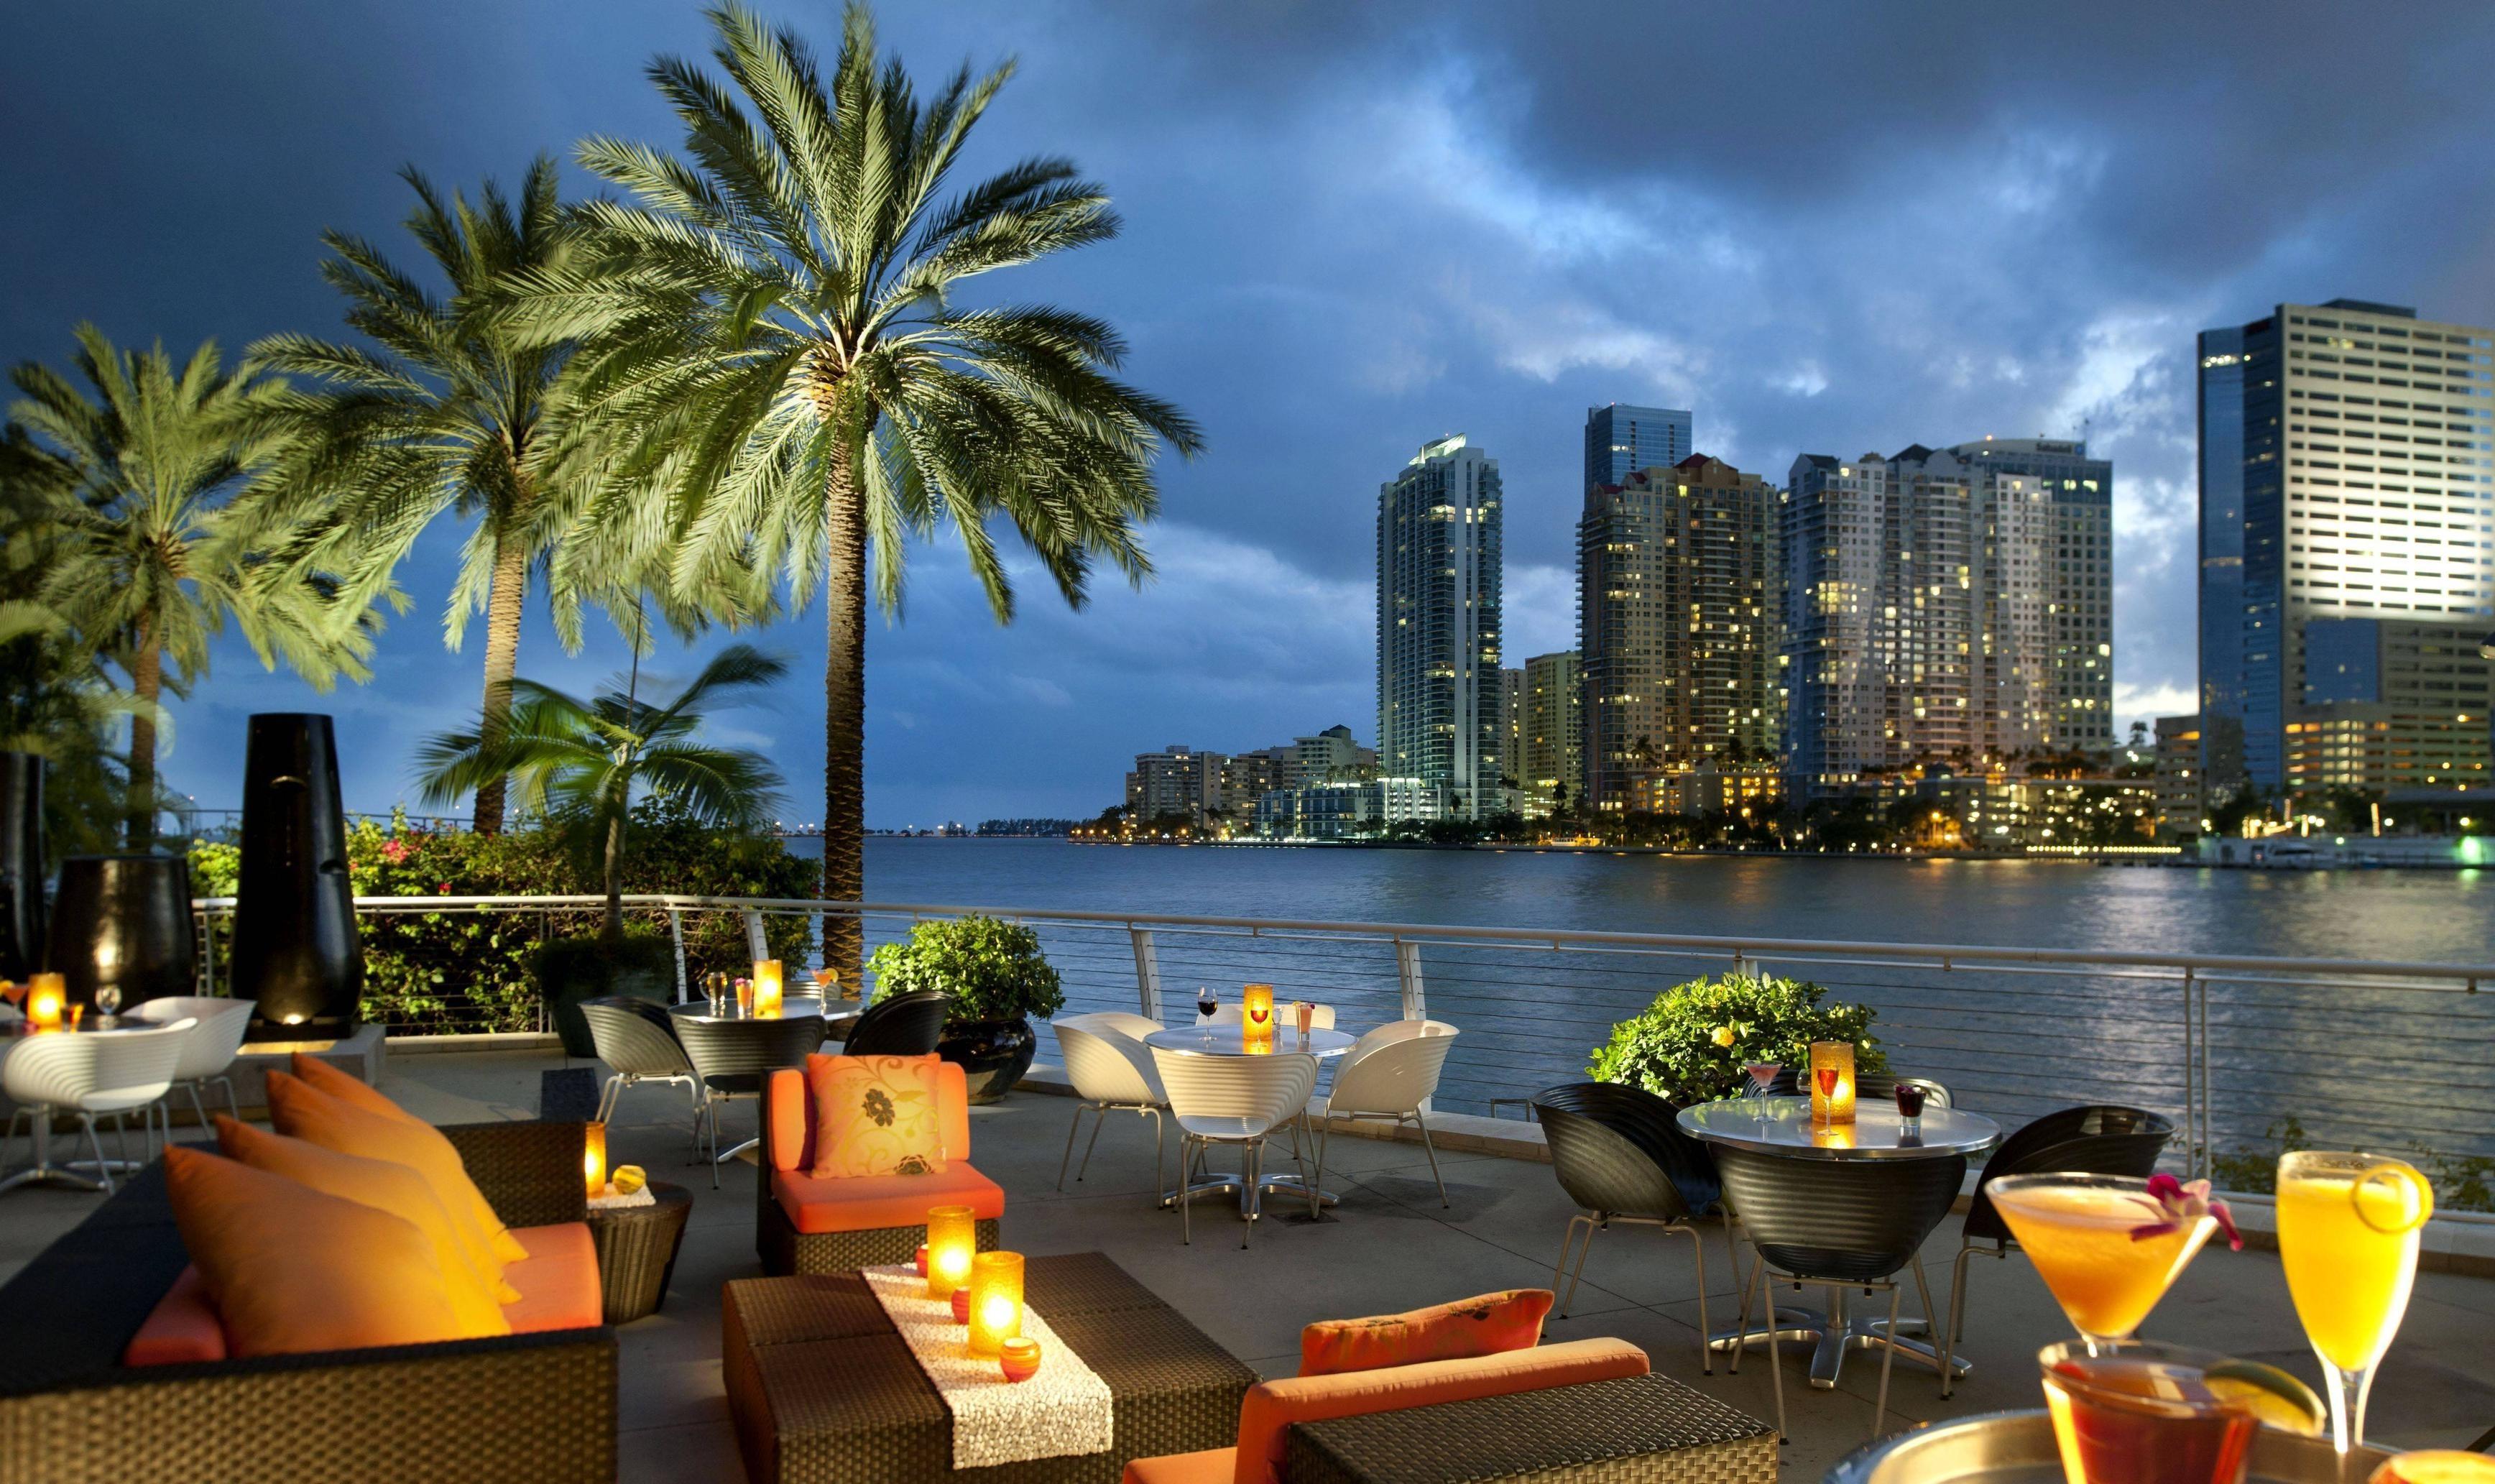 Download wallpaper Miami, Florida, USA, city free desktop .